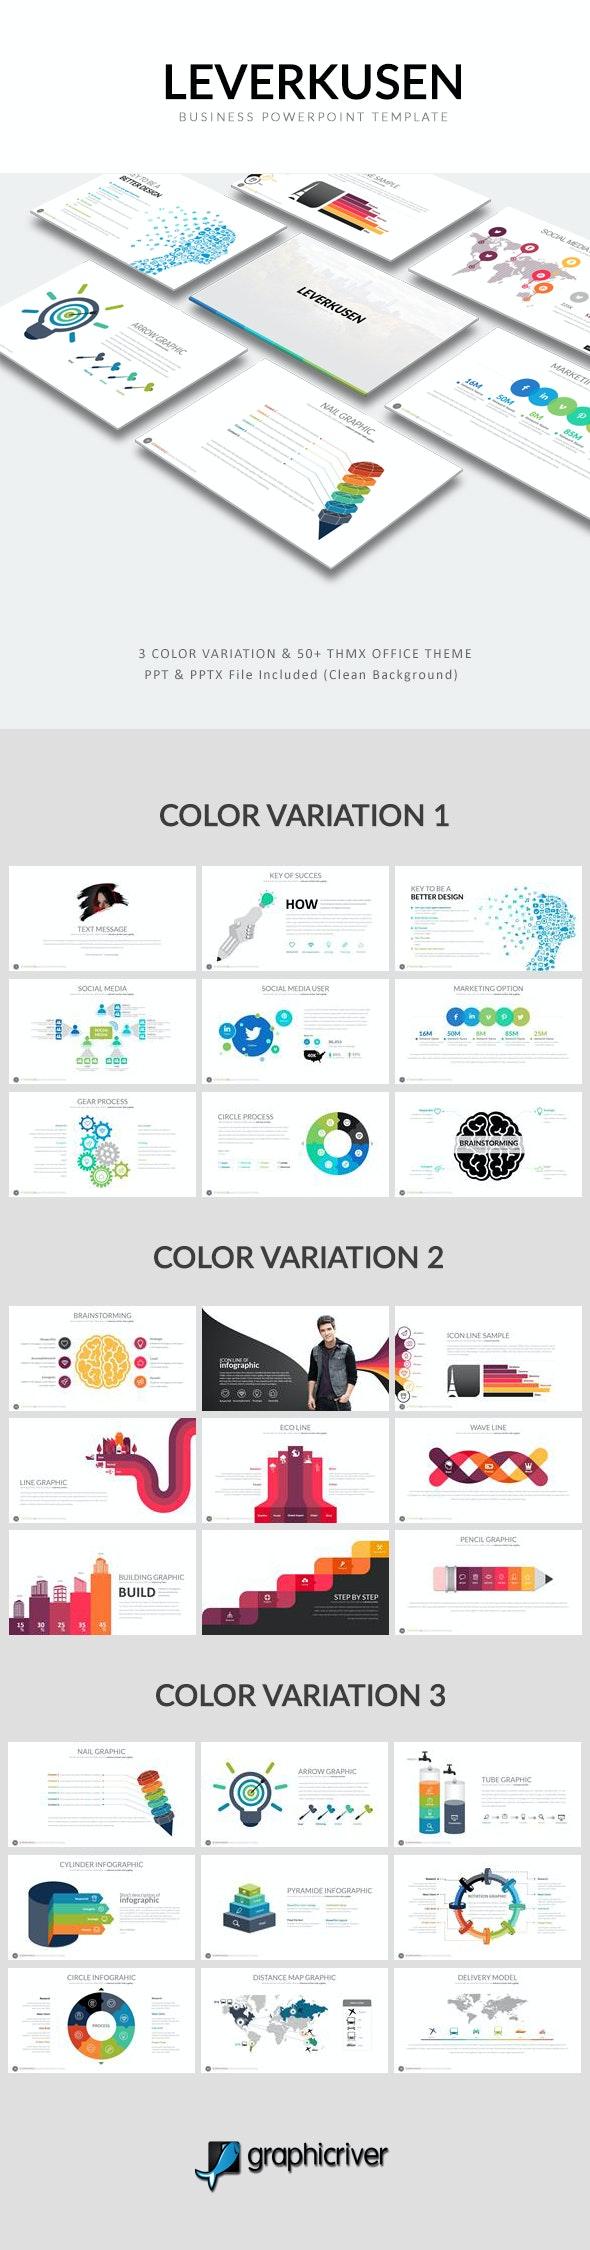 Leverkusen Powerpoint Template - Business PowerPoint Templates